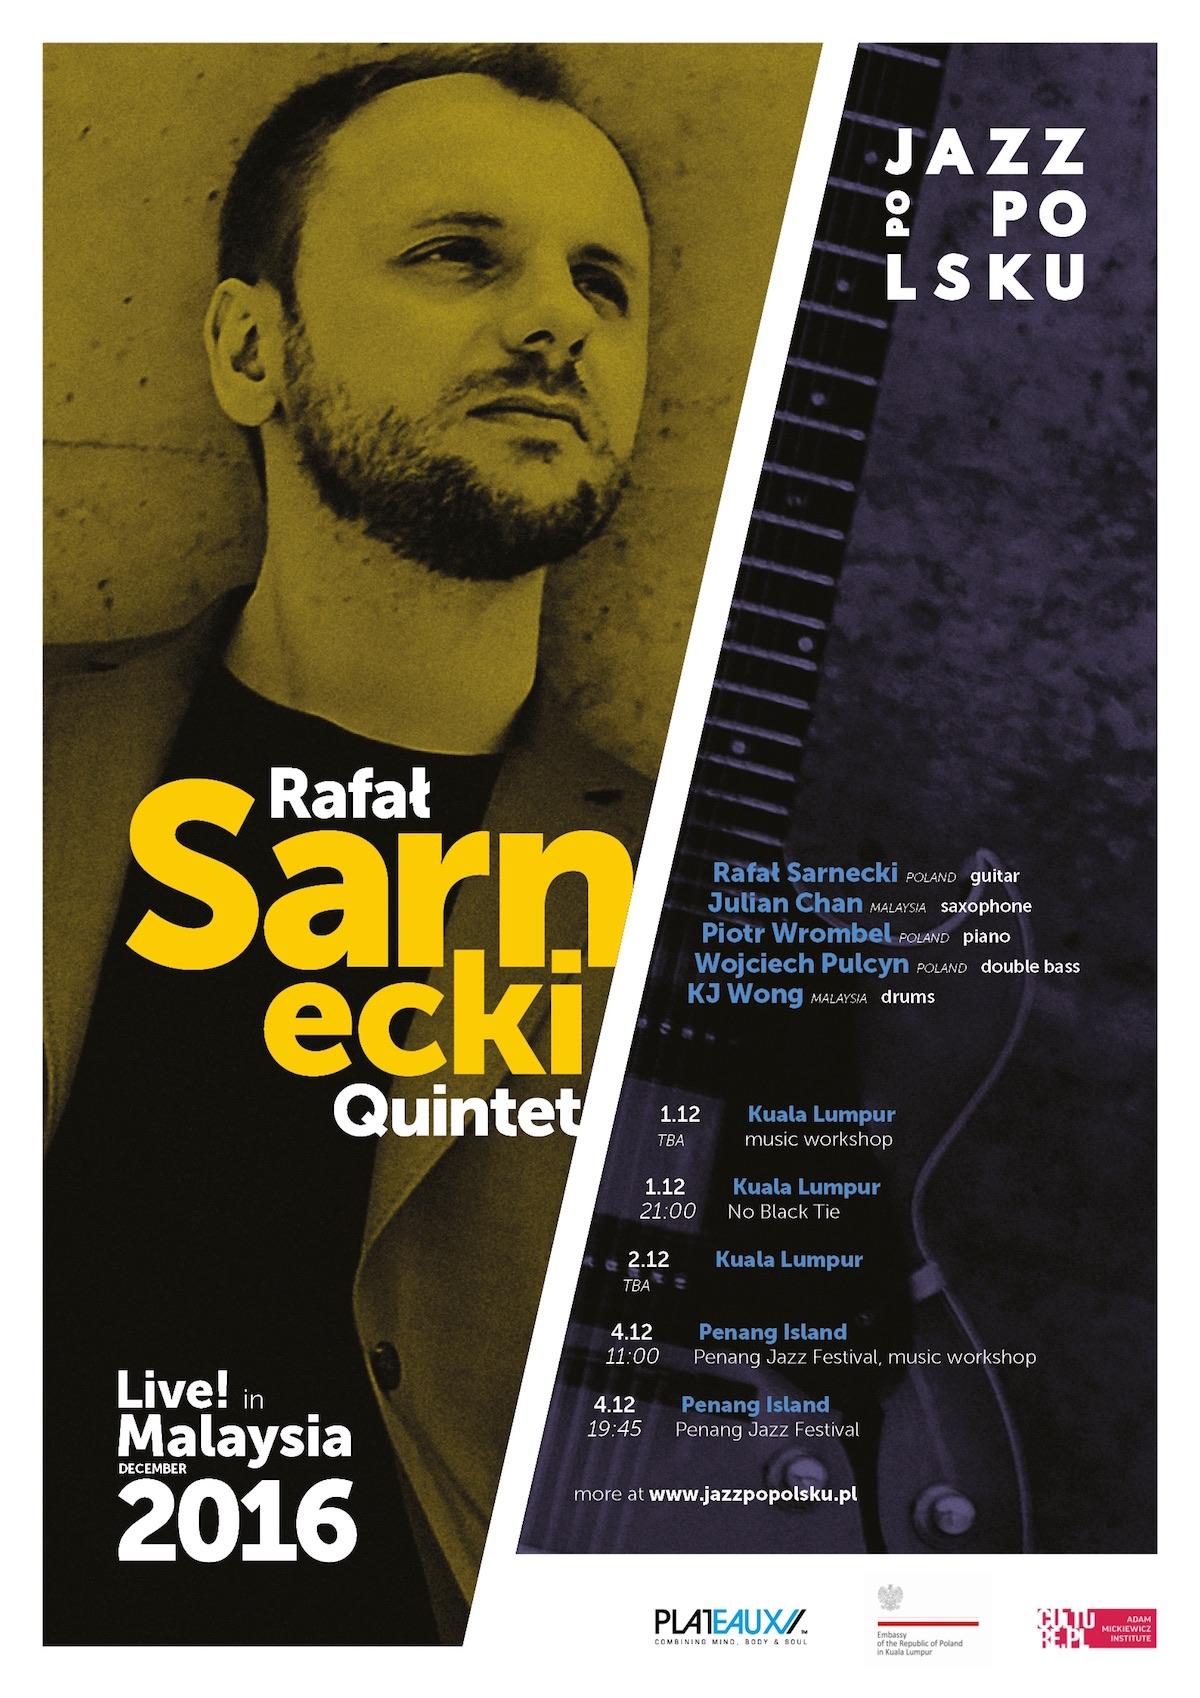 Rafał Sarnecki Live in Malaysia 2016